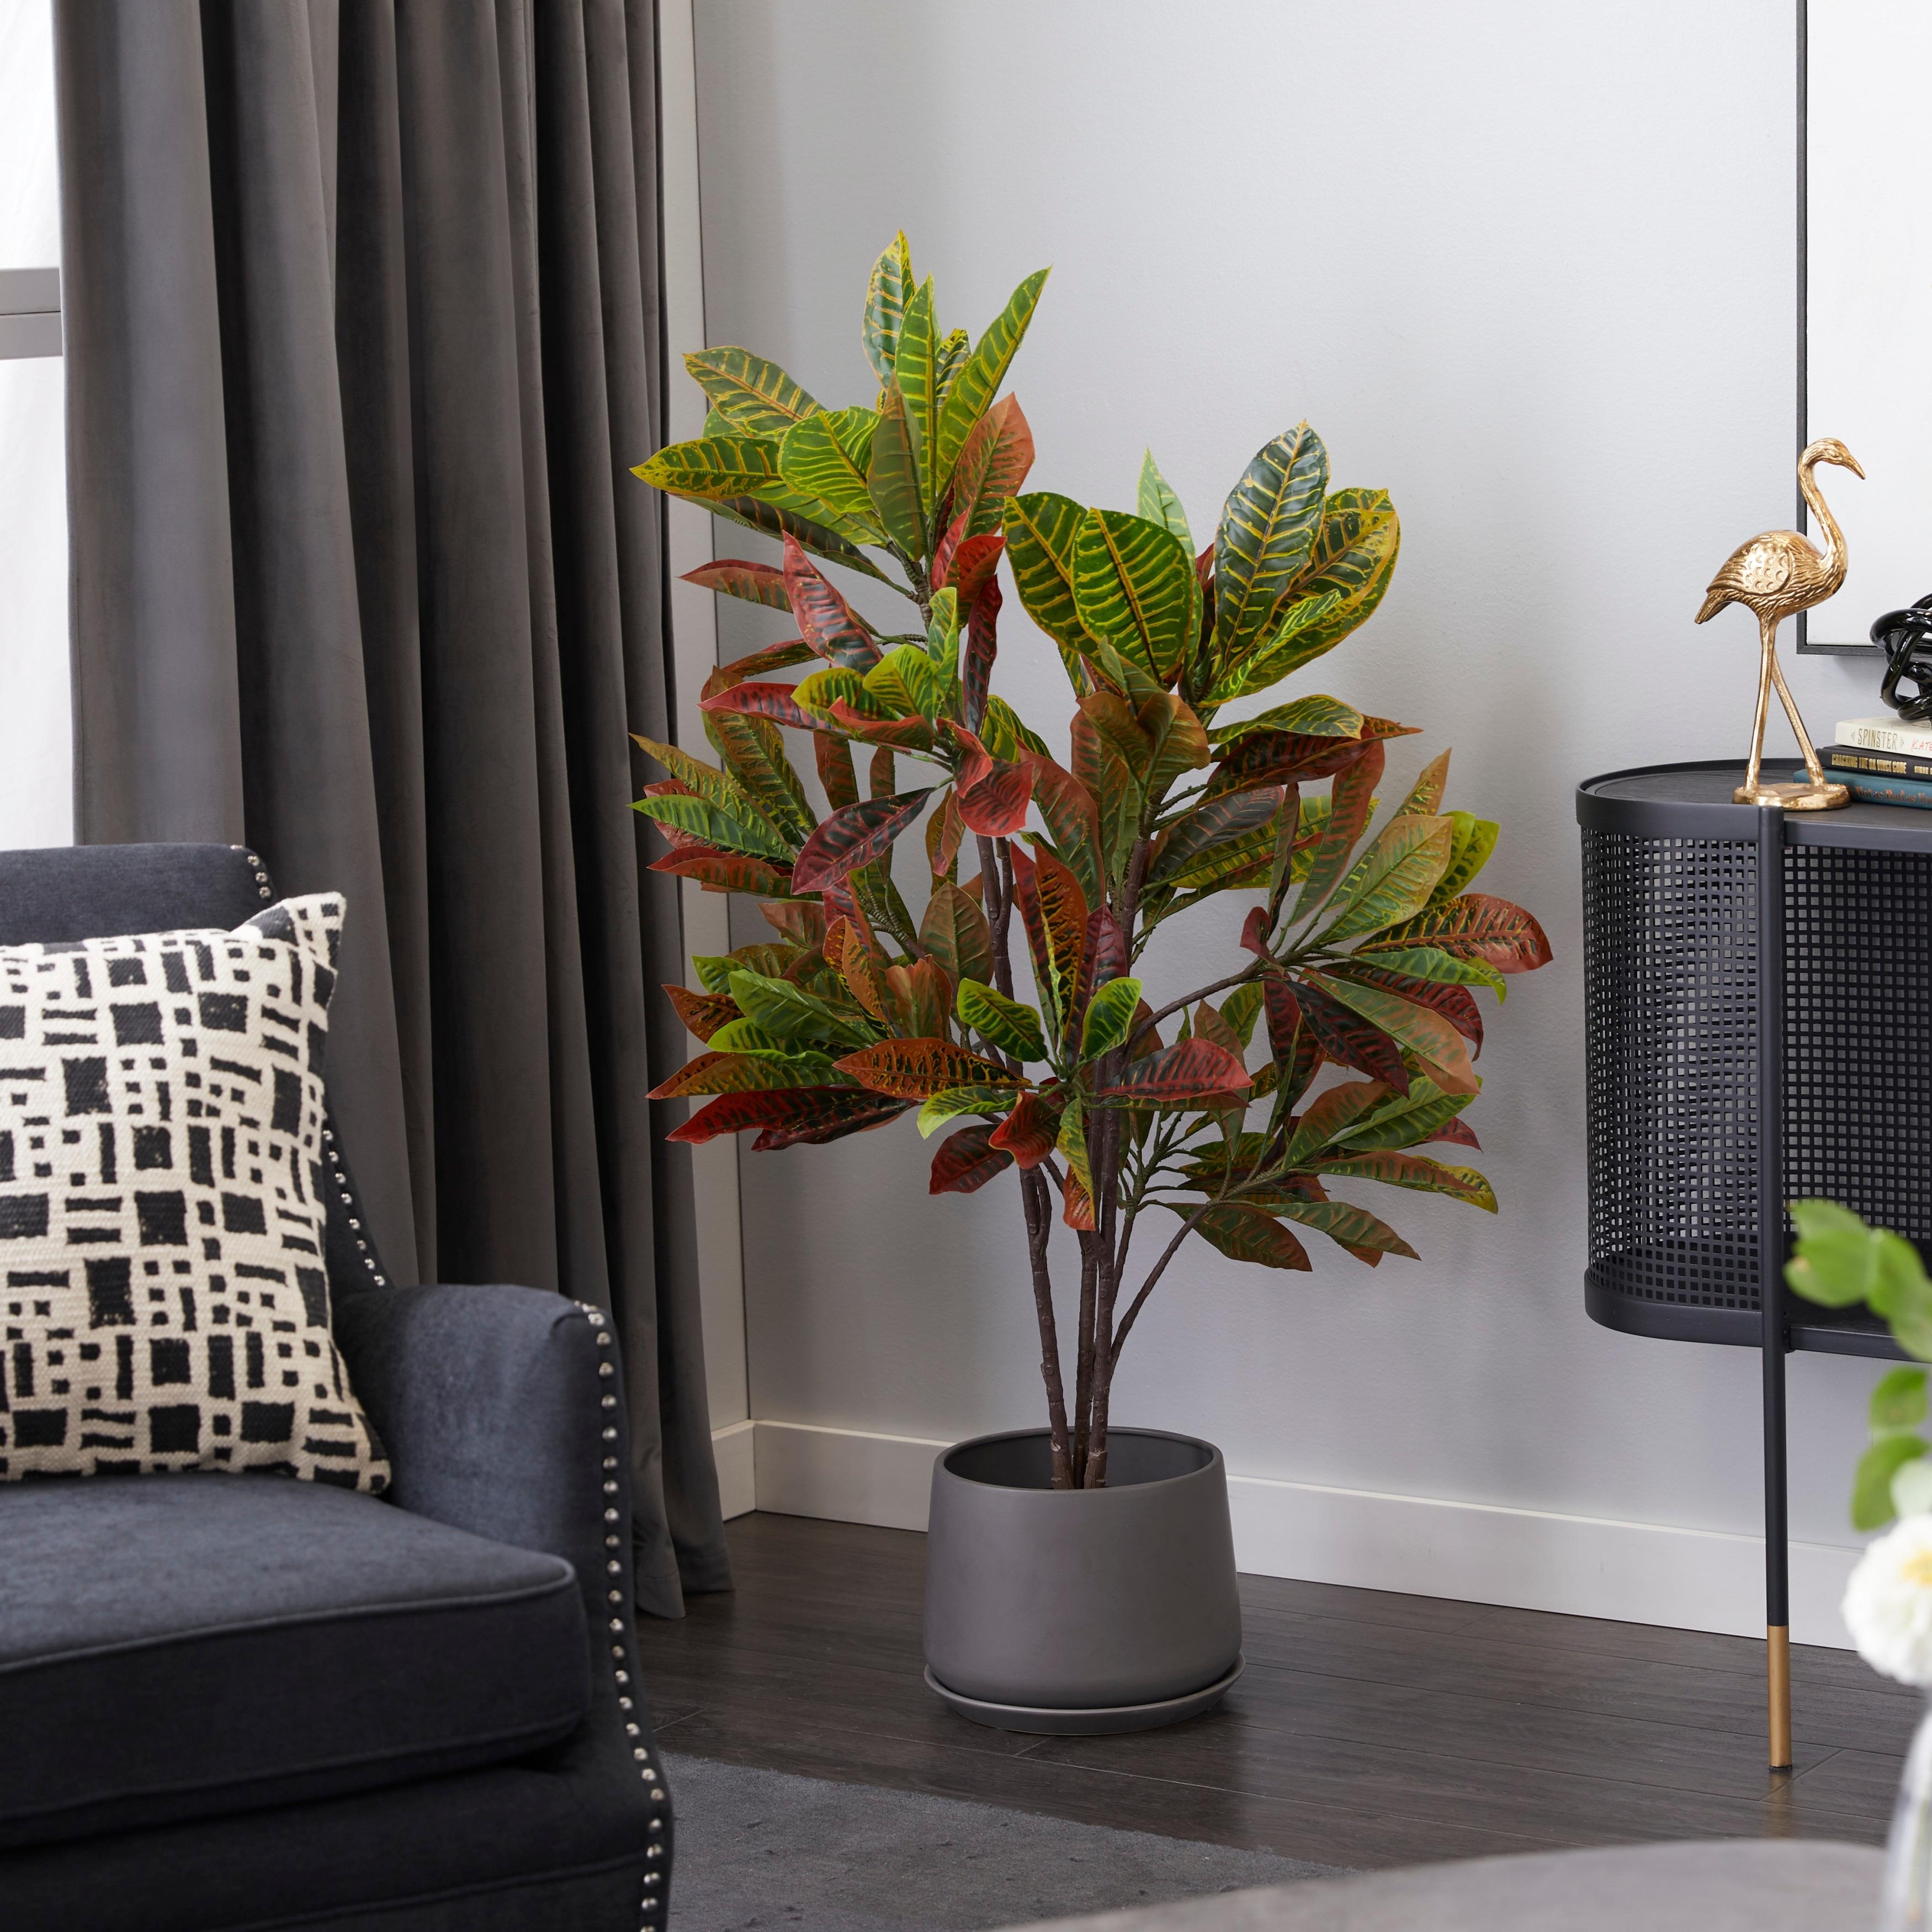 Artificial Plants In Pots For Home Decor Indoor 46 Green 25x27x53 Overstock 32044075